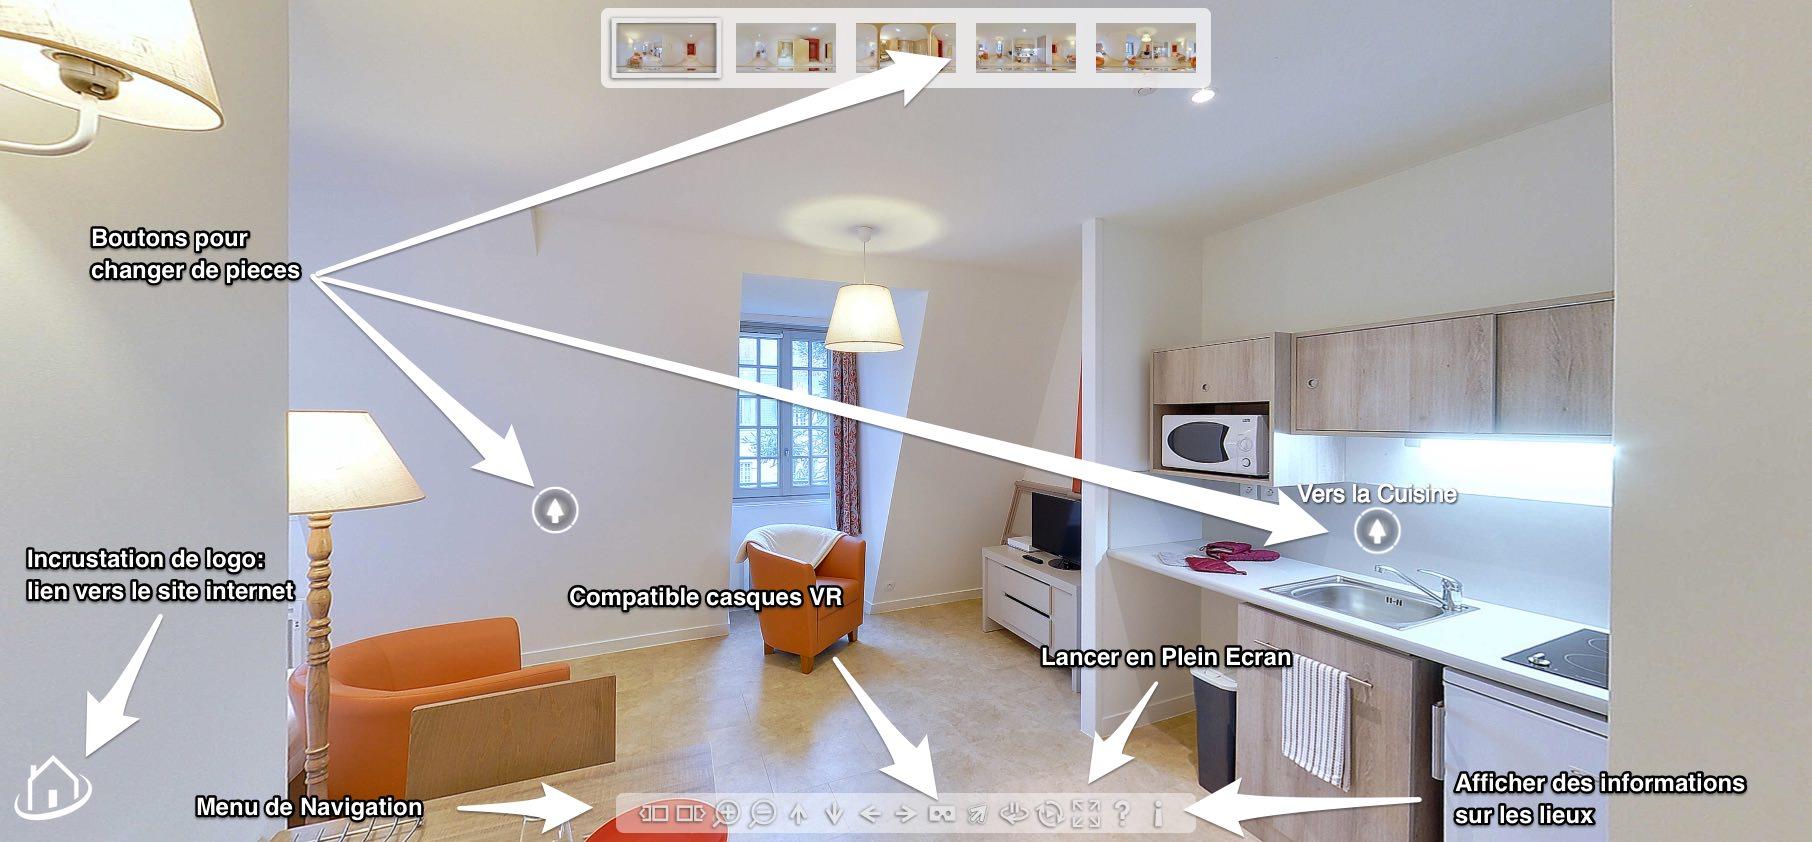 visite-virtuelle-immobilier